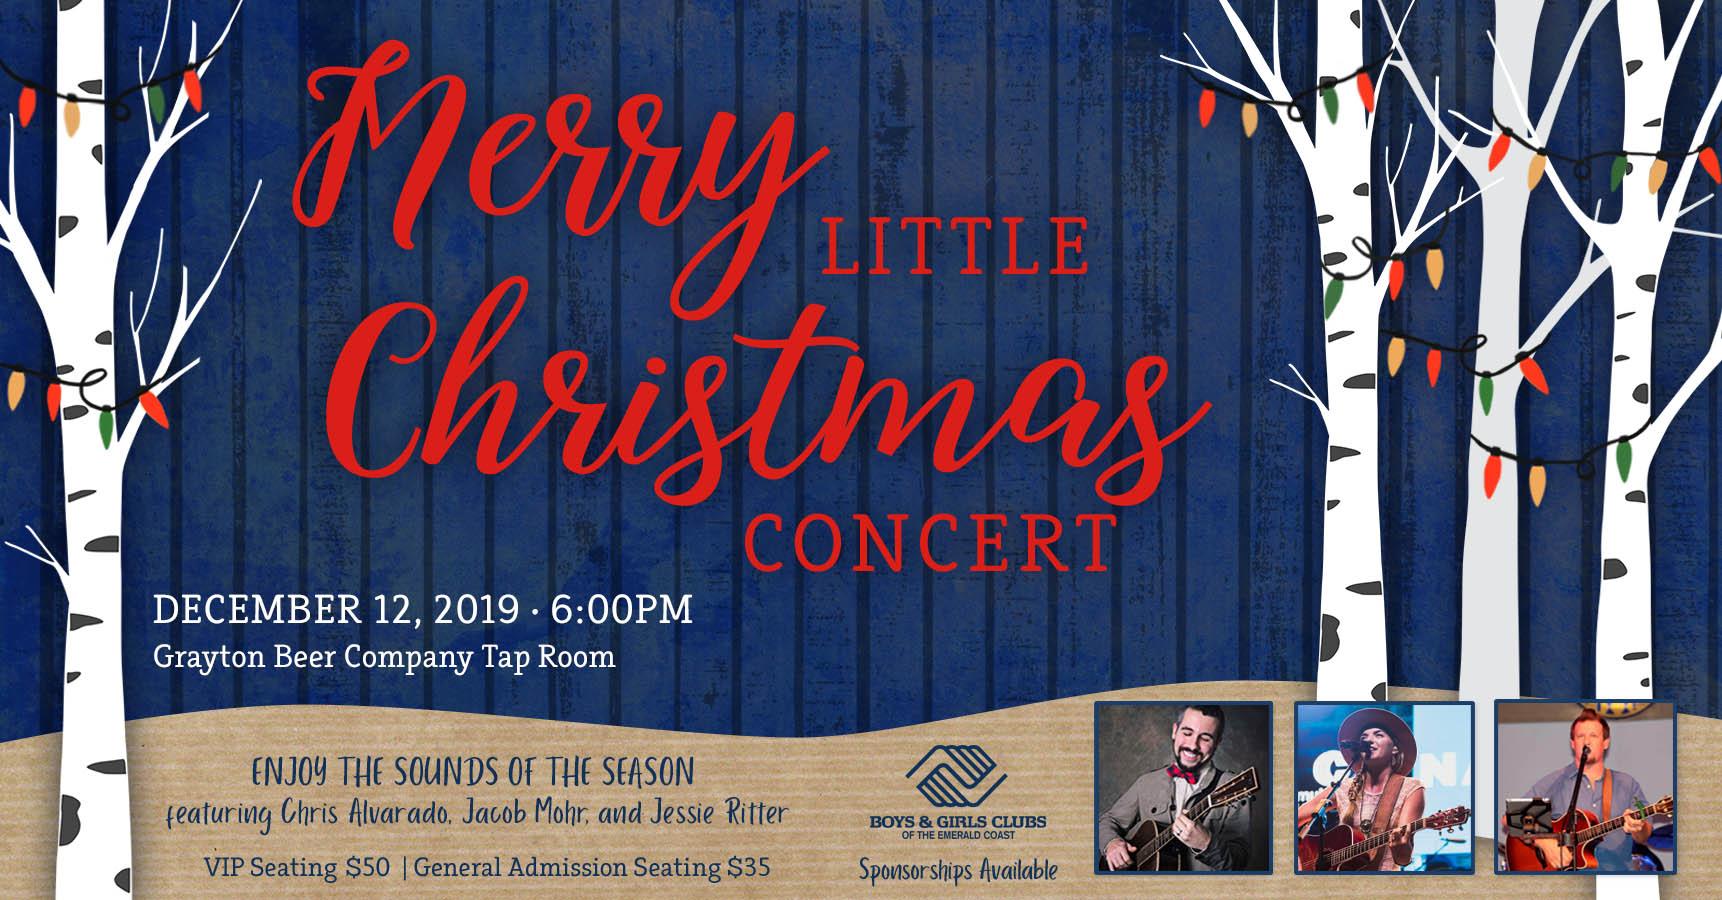 Christmas Concerts 2019 Near Me Merry Little Christmas Concert